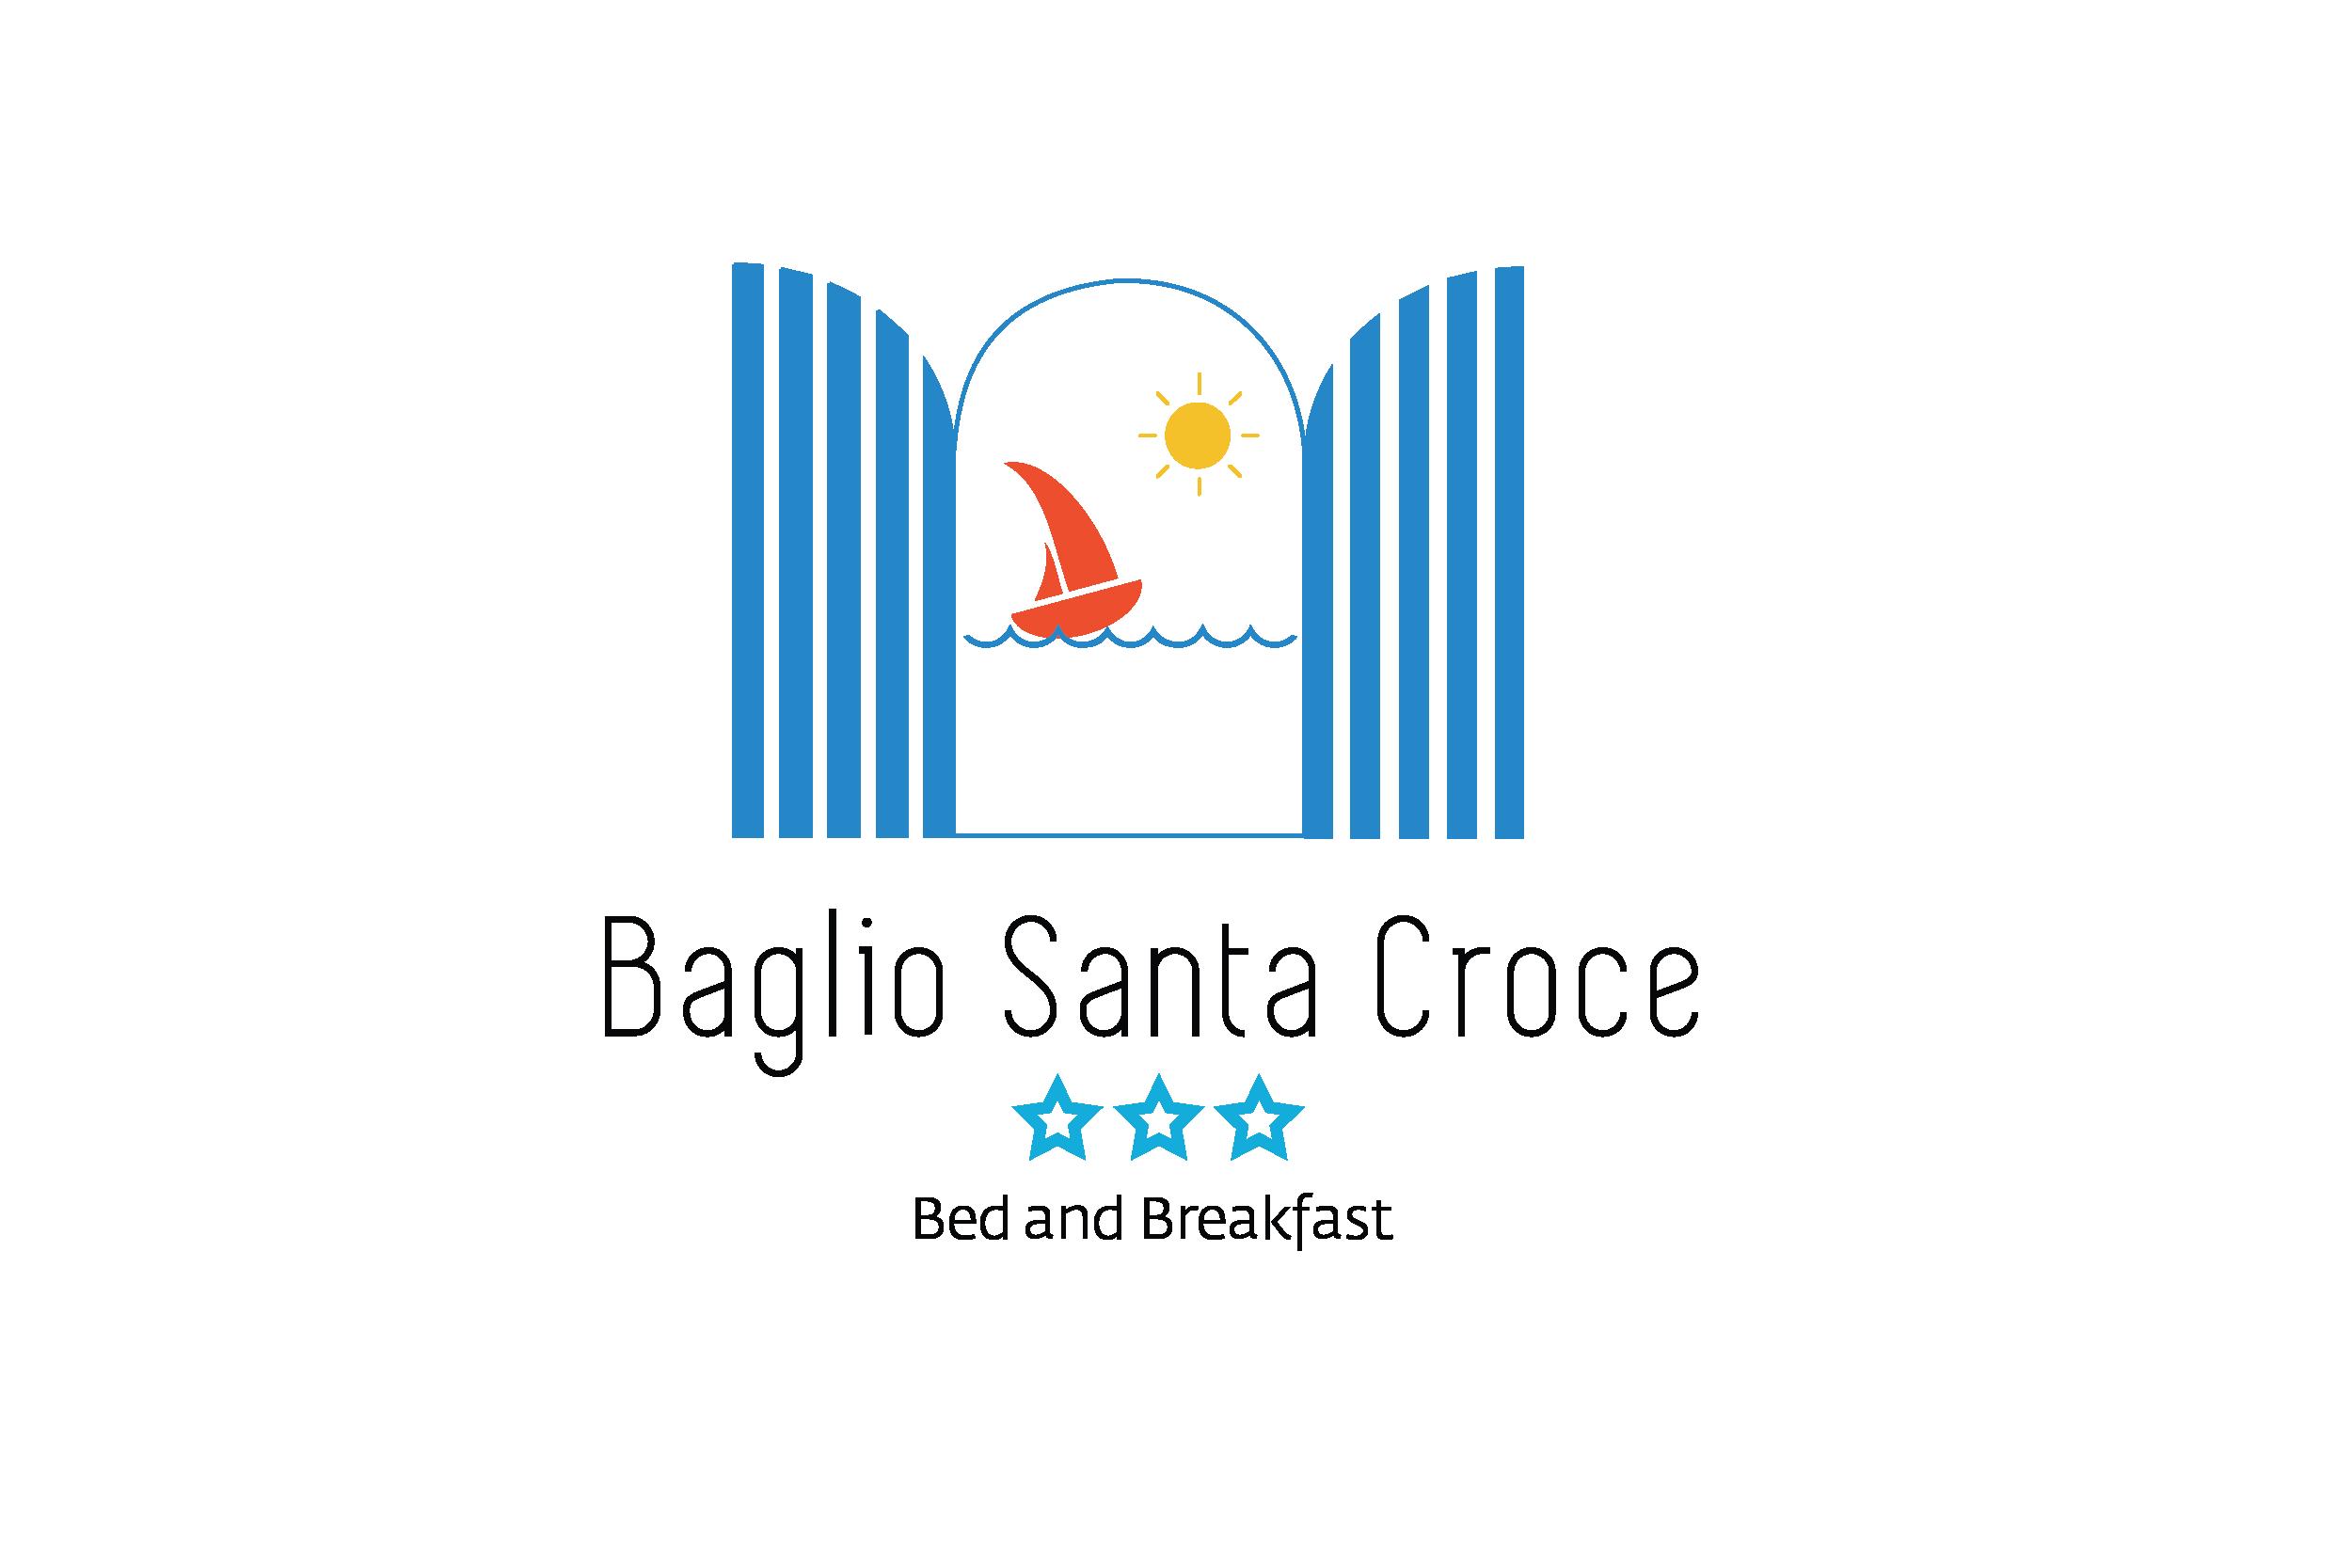 Baglio Santa Croce B&B